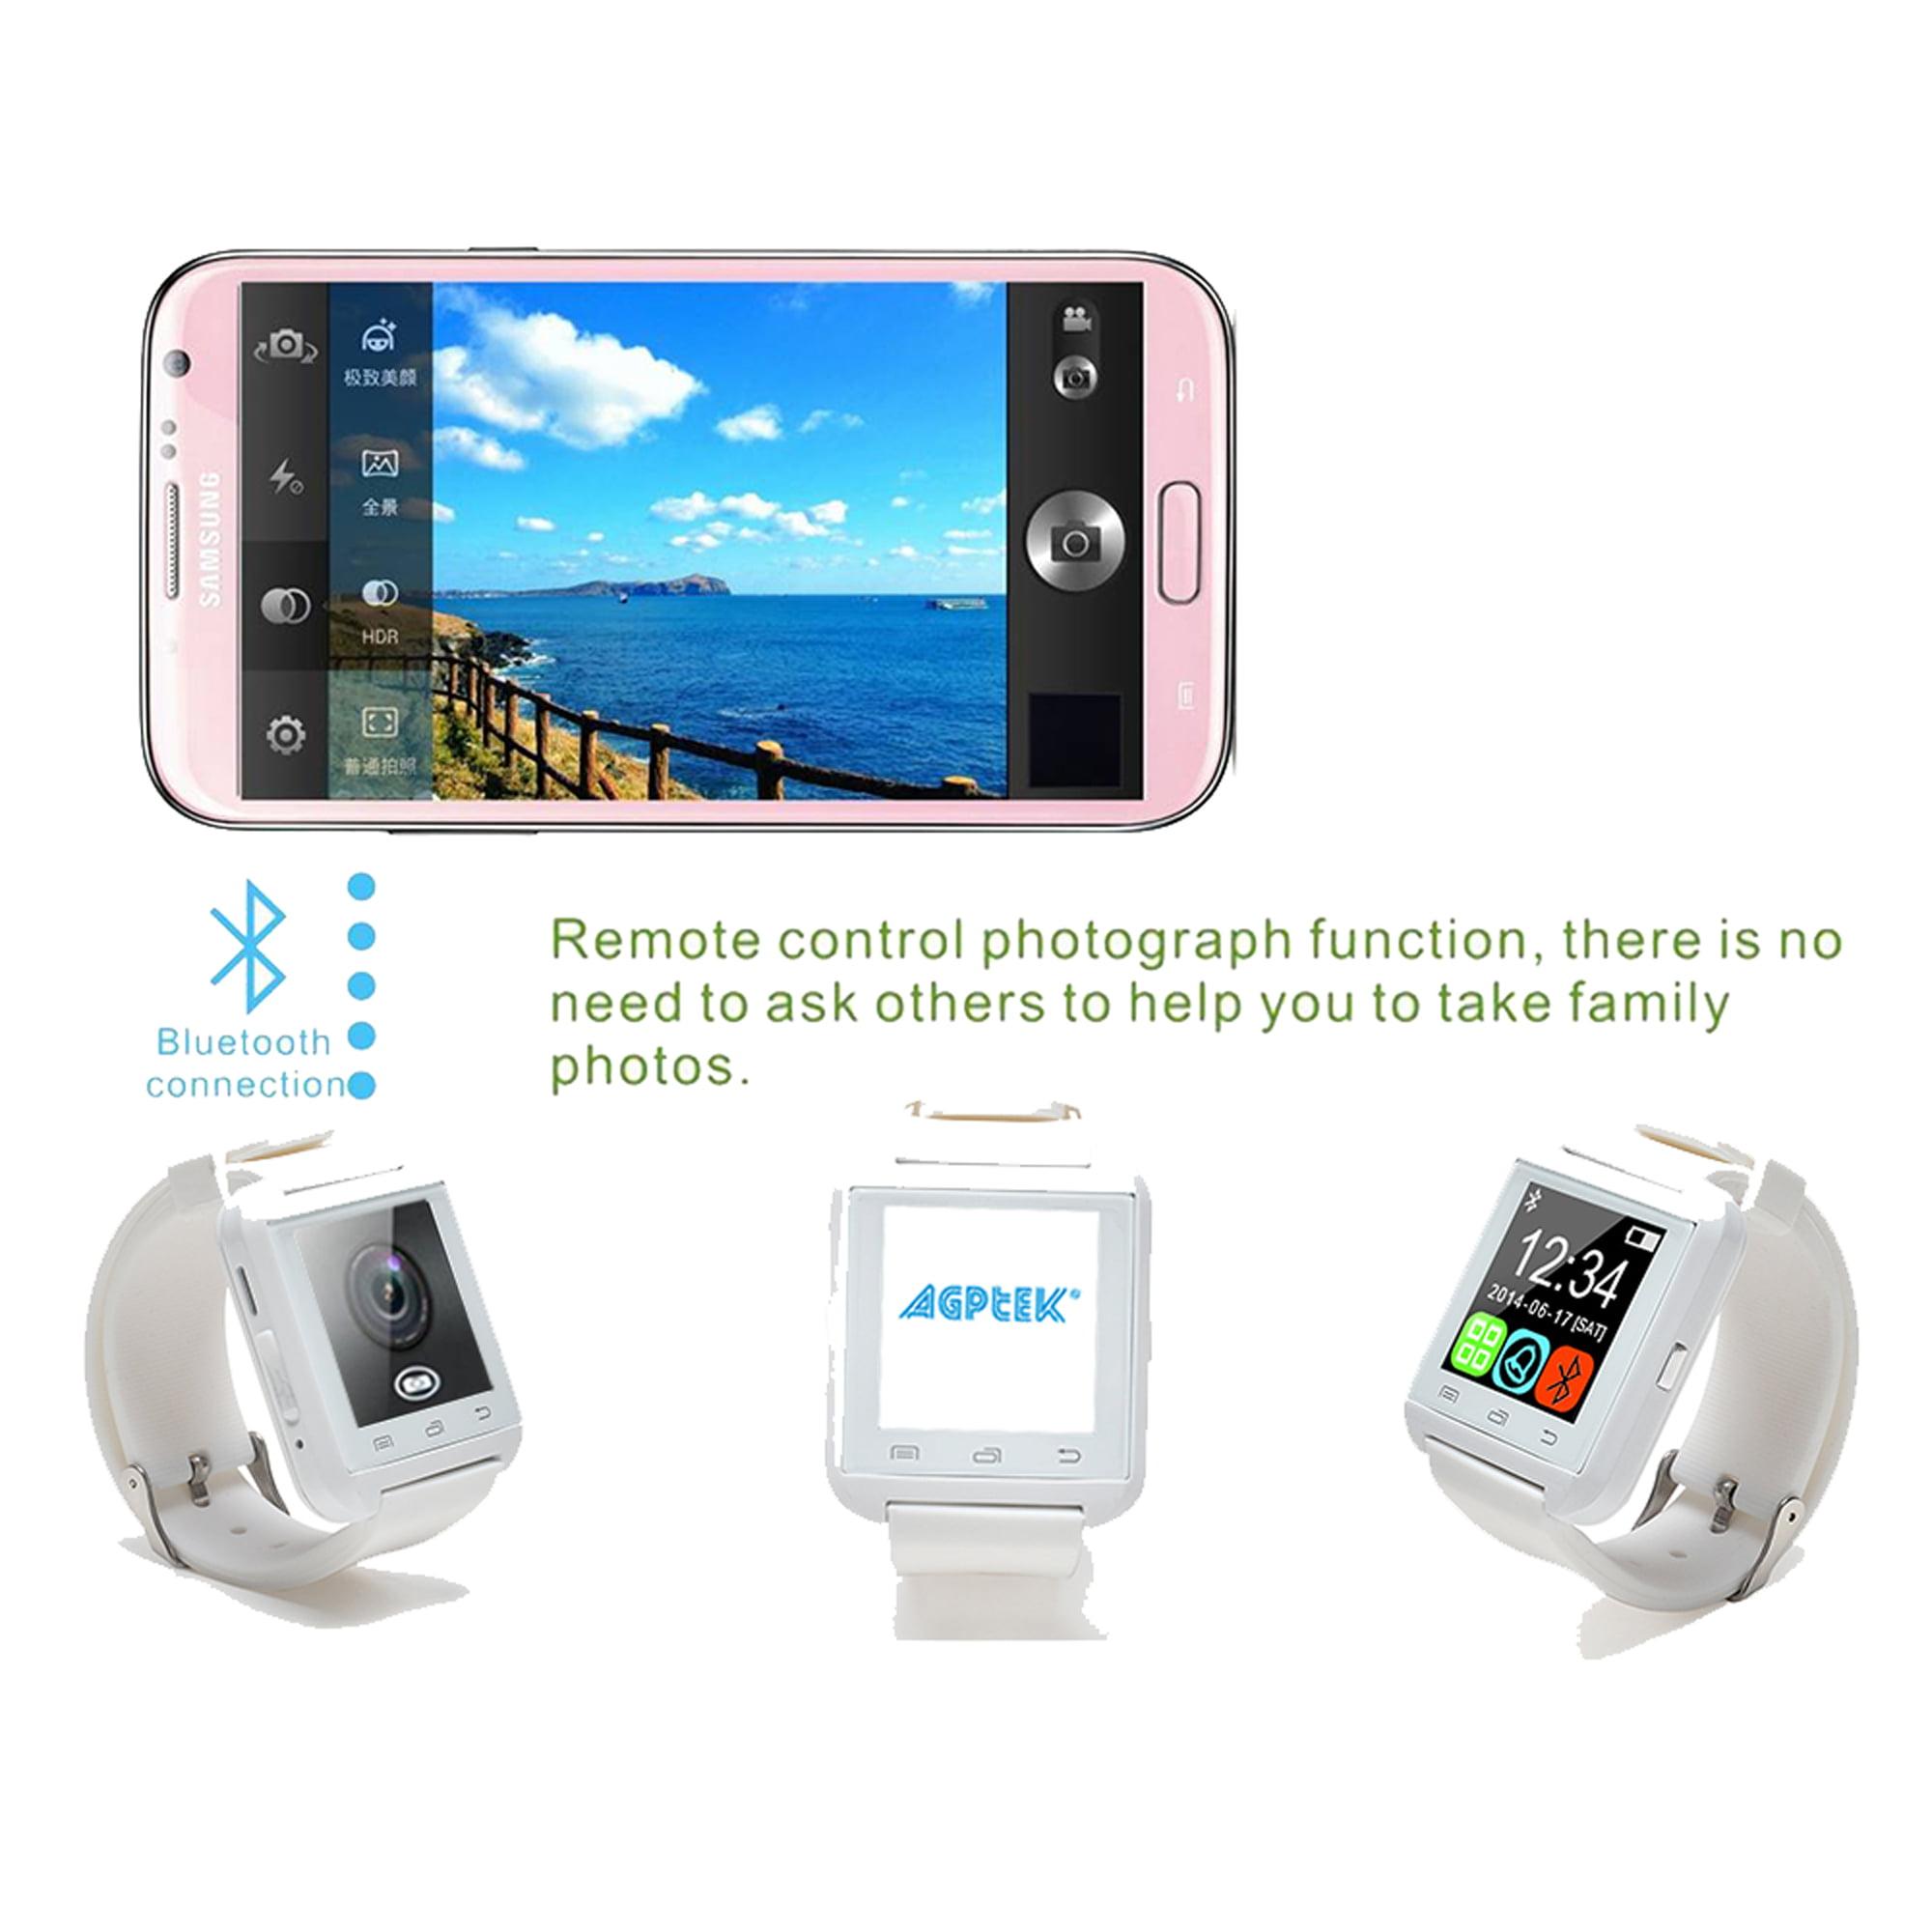 Phone Long Battery Life Android Phone agptek u8l bluetooth smartwatch wristwatch long battery life for iphone samsung android phones previous